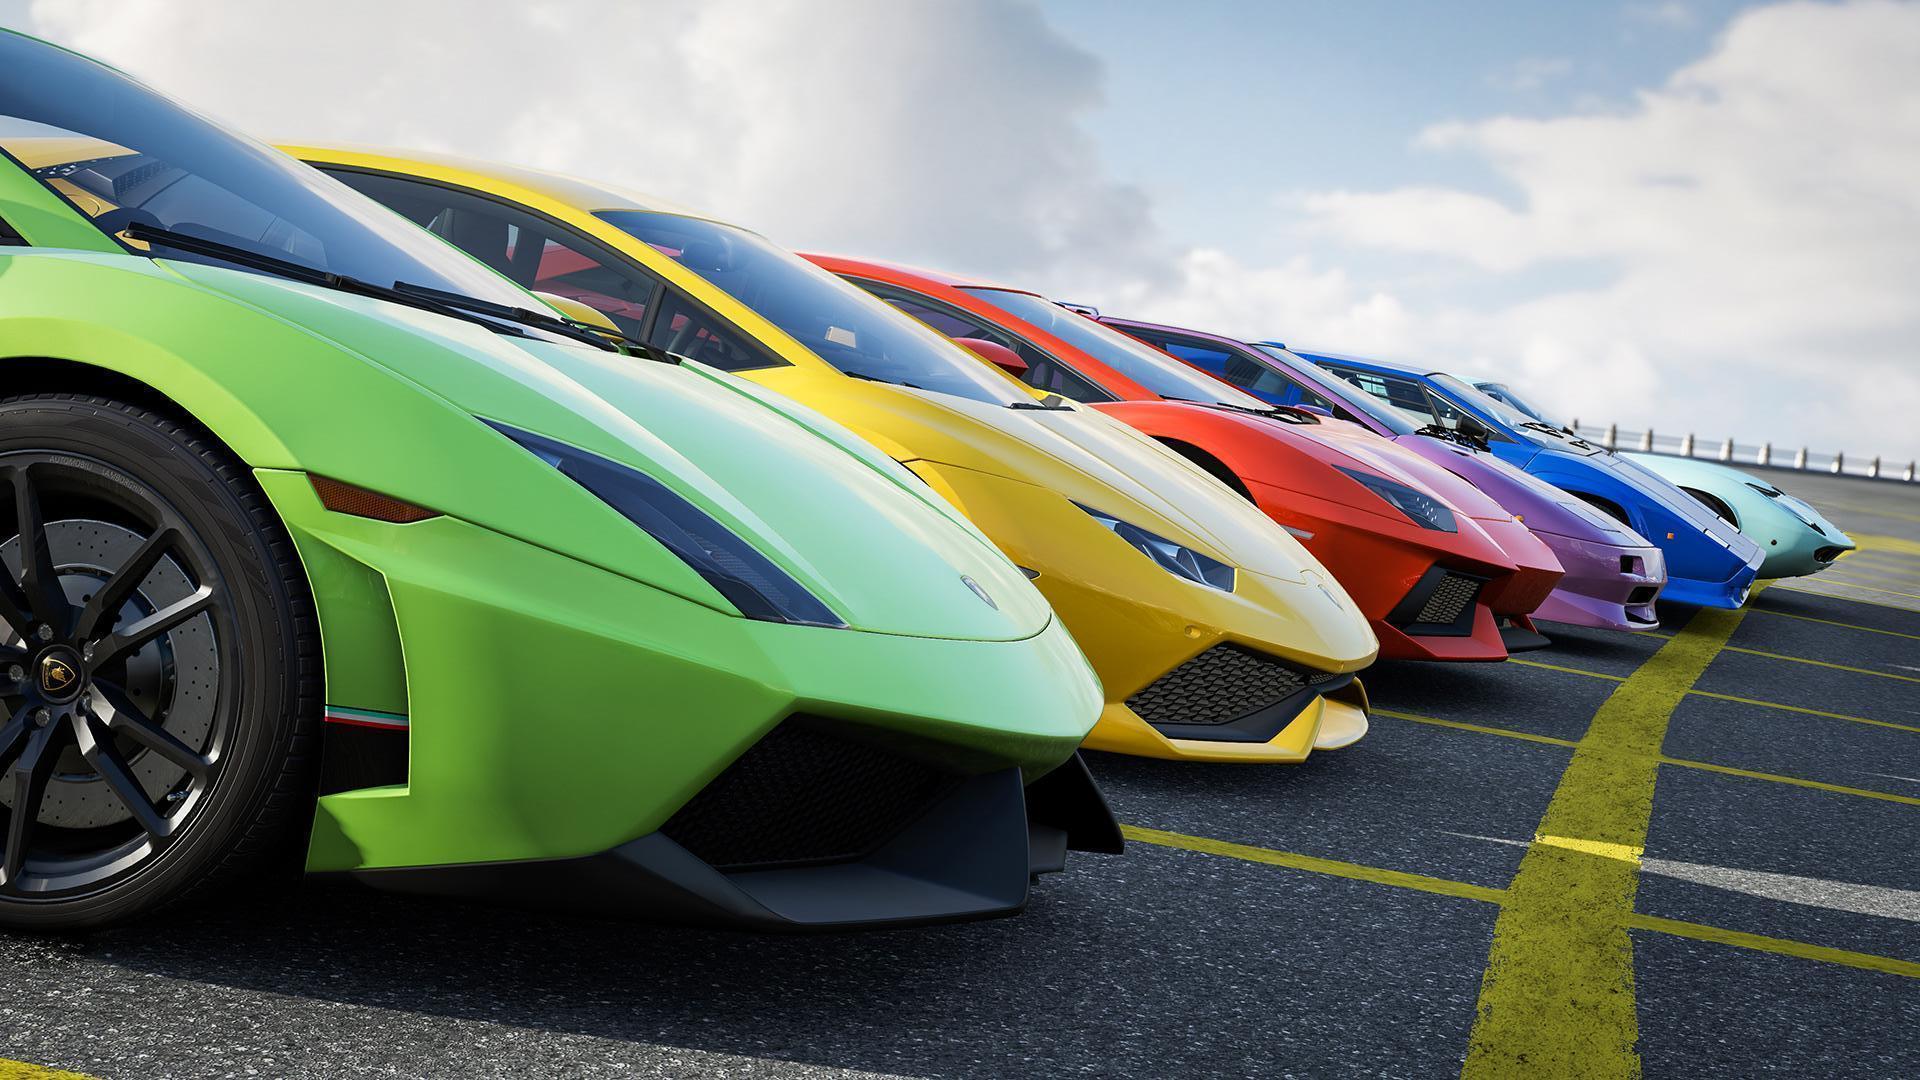 Lamborghini Centenario Wallpapers Wallpaper Cave